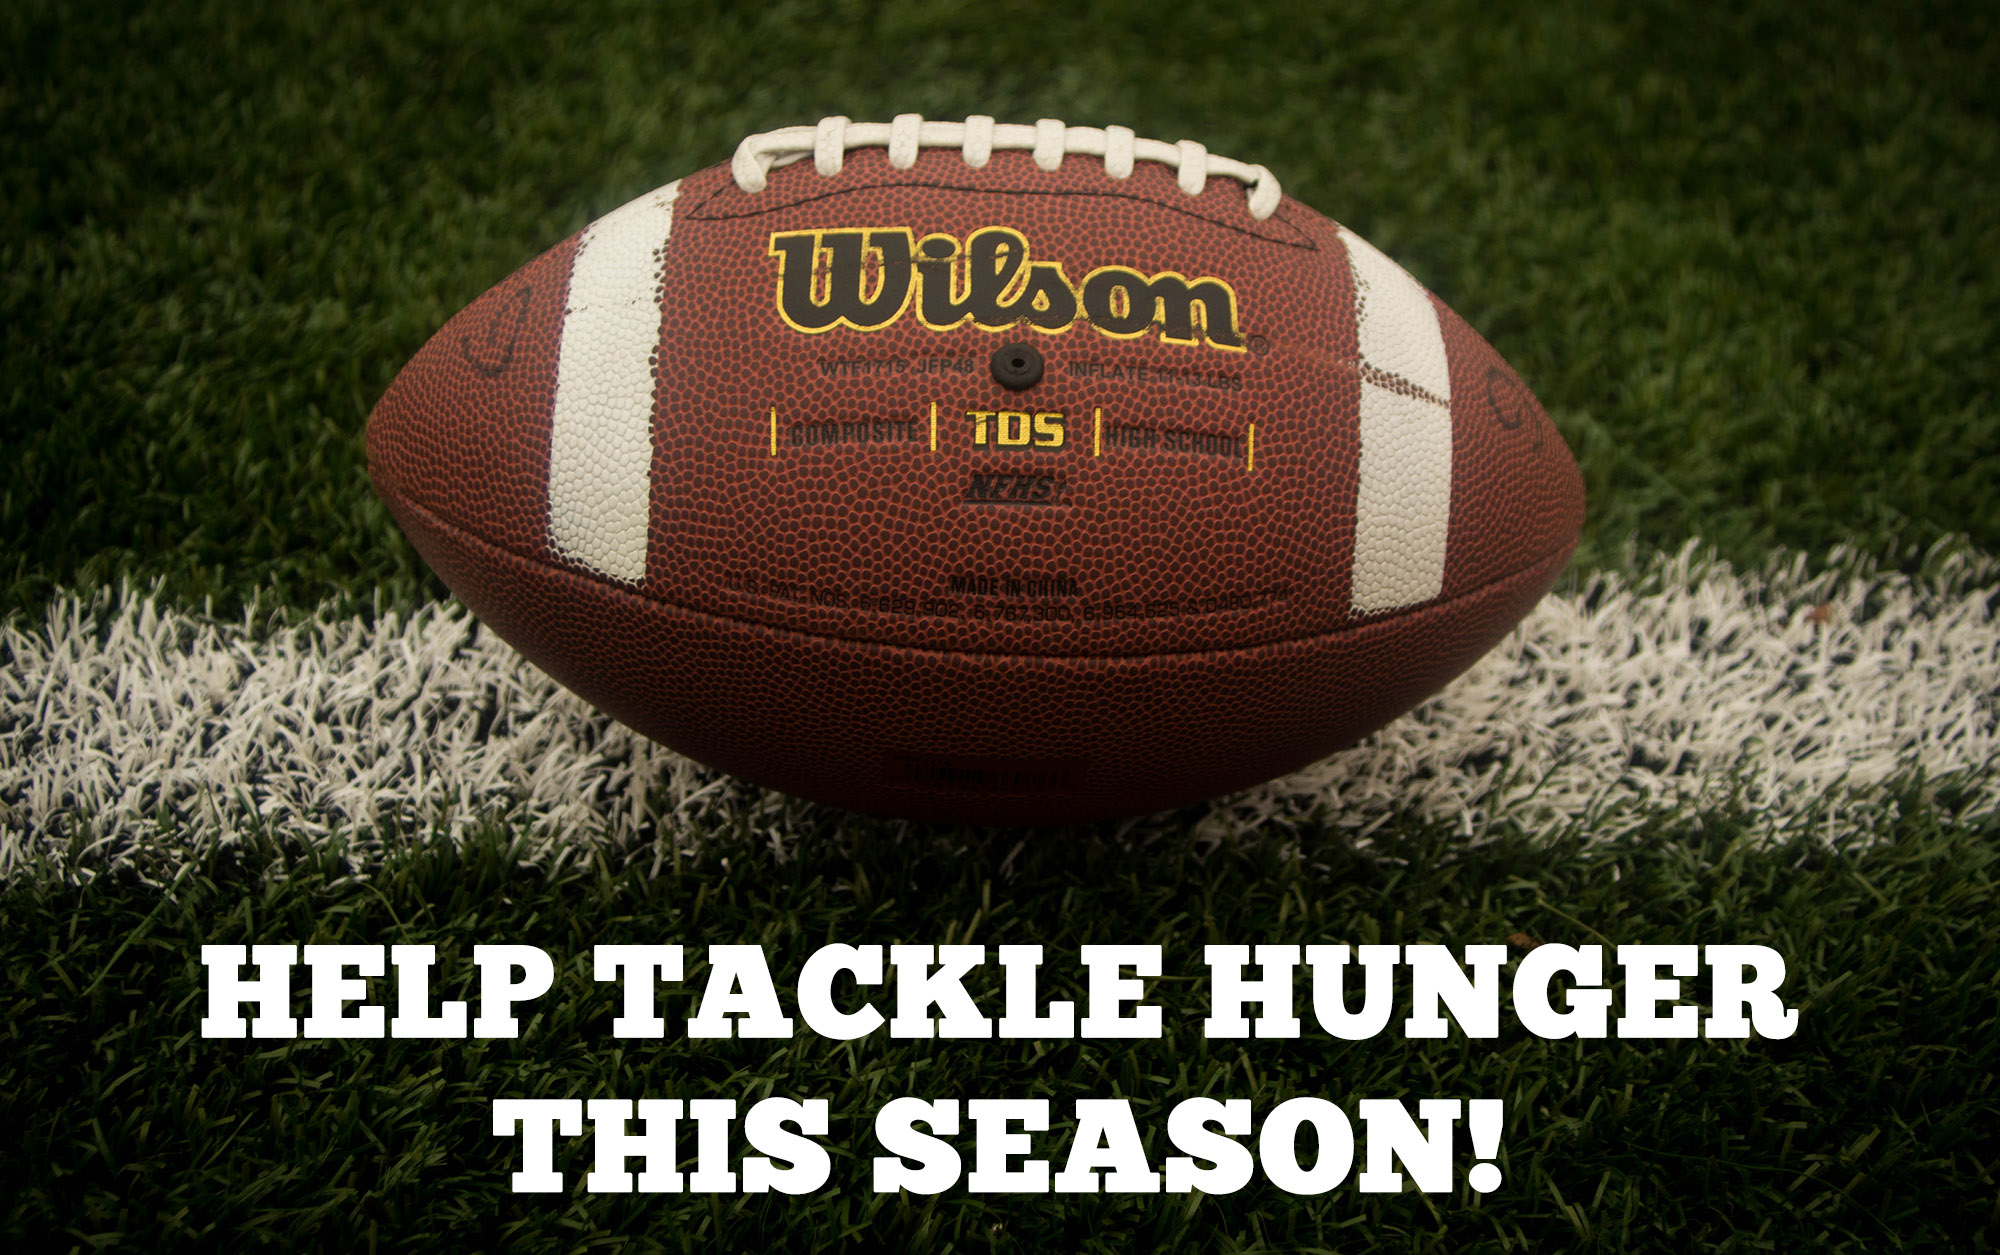 HELP Tackle Hunger This Season (2018).jpg